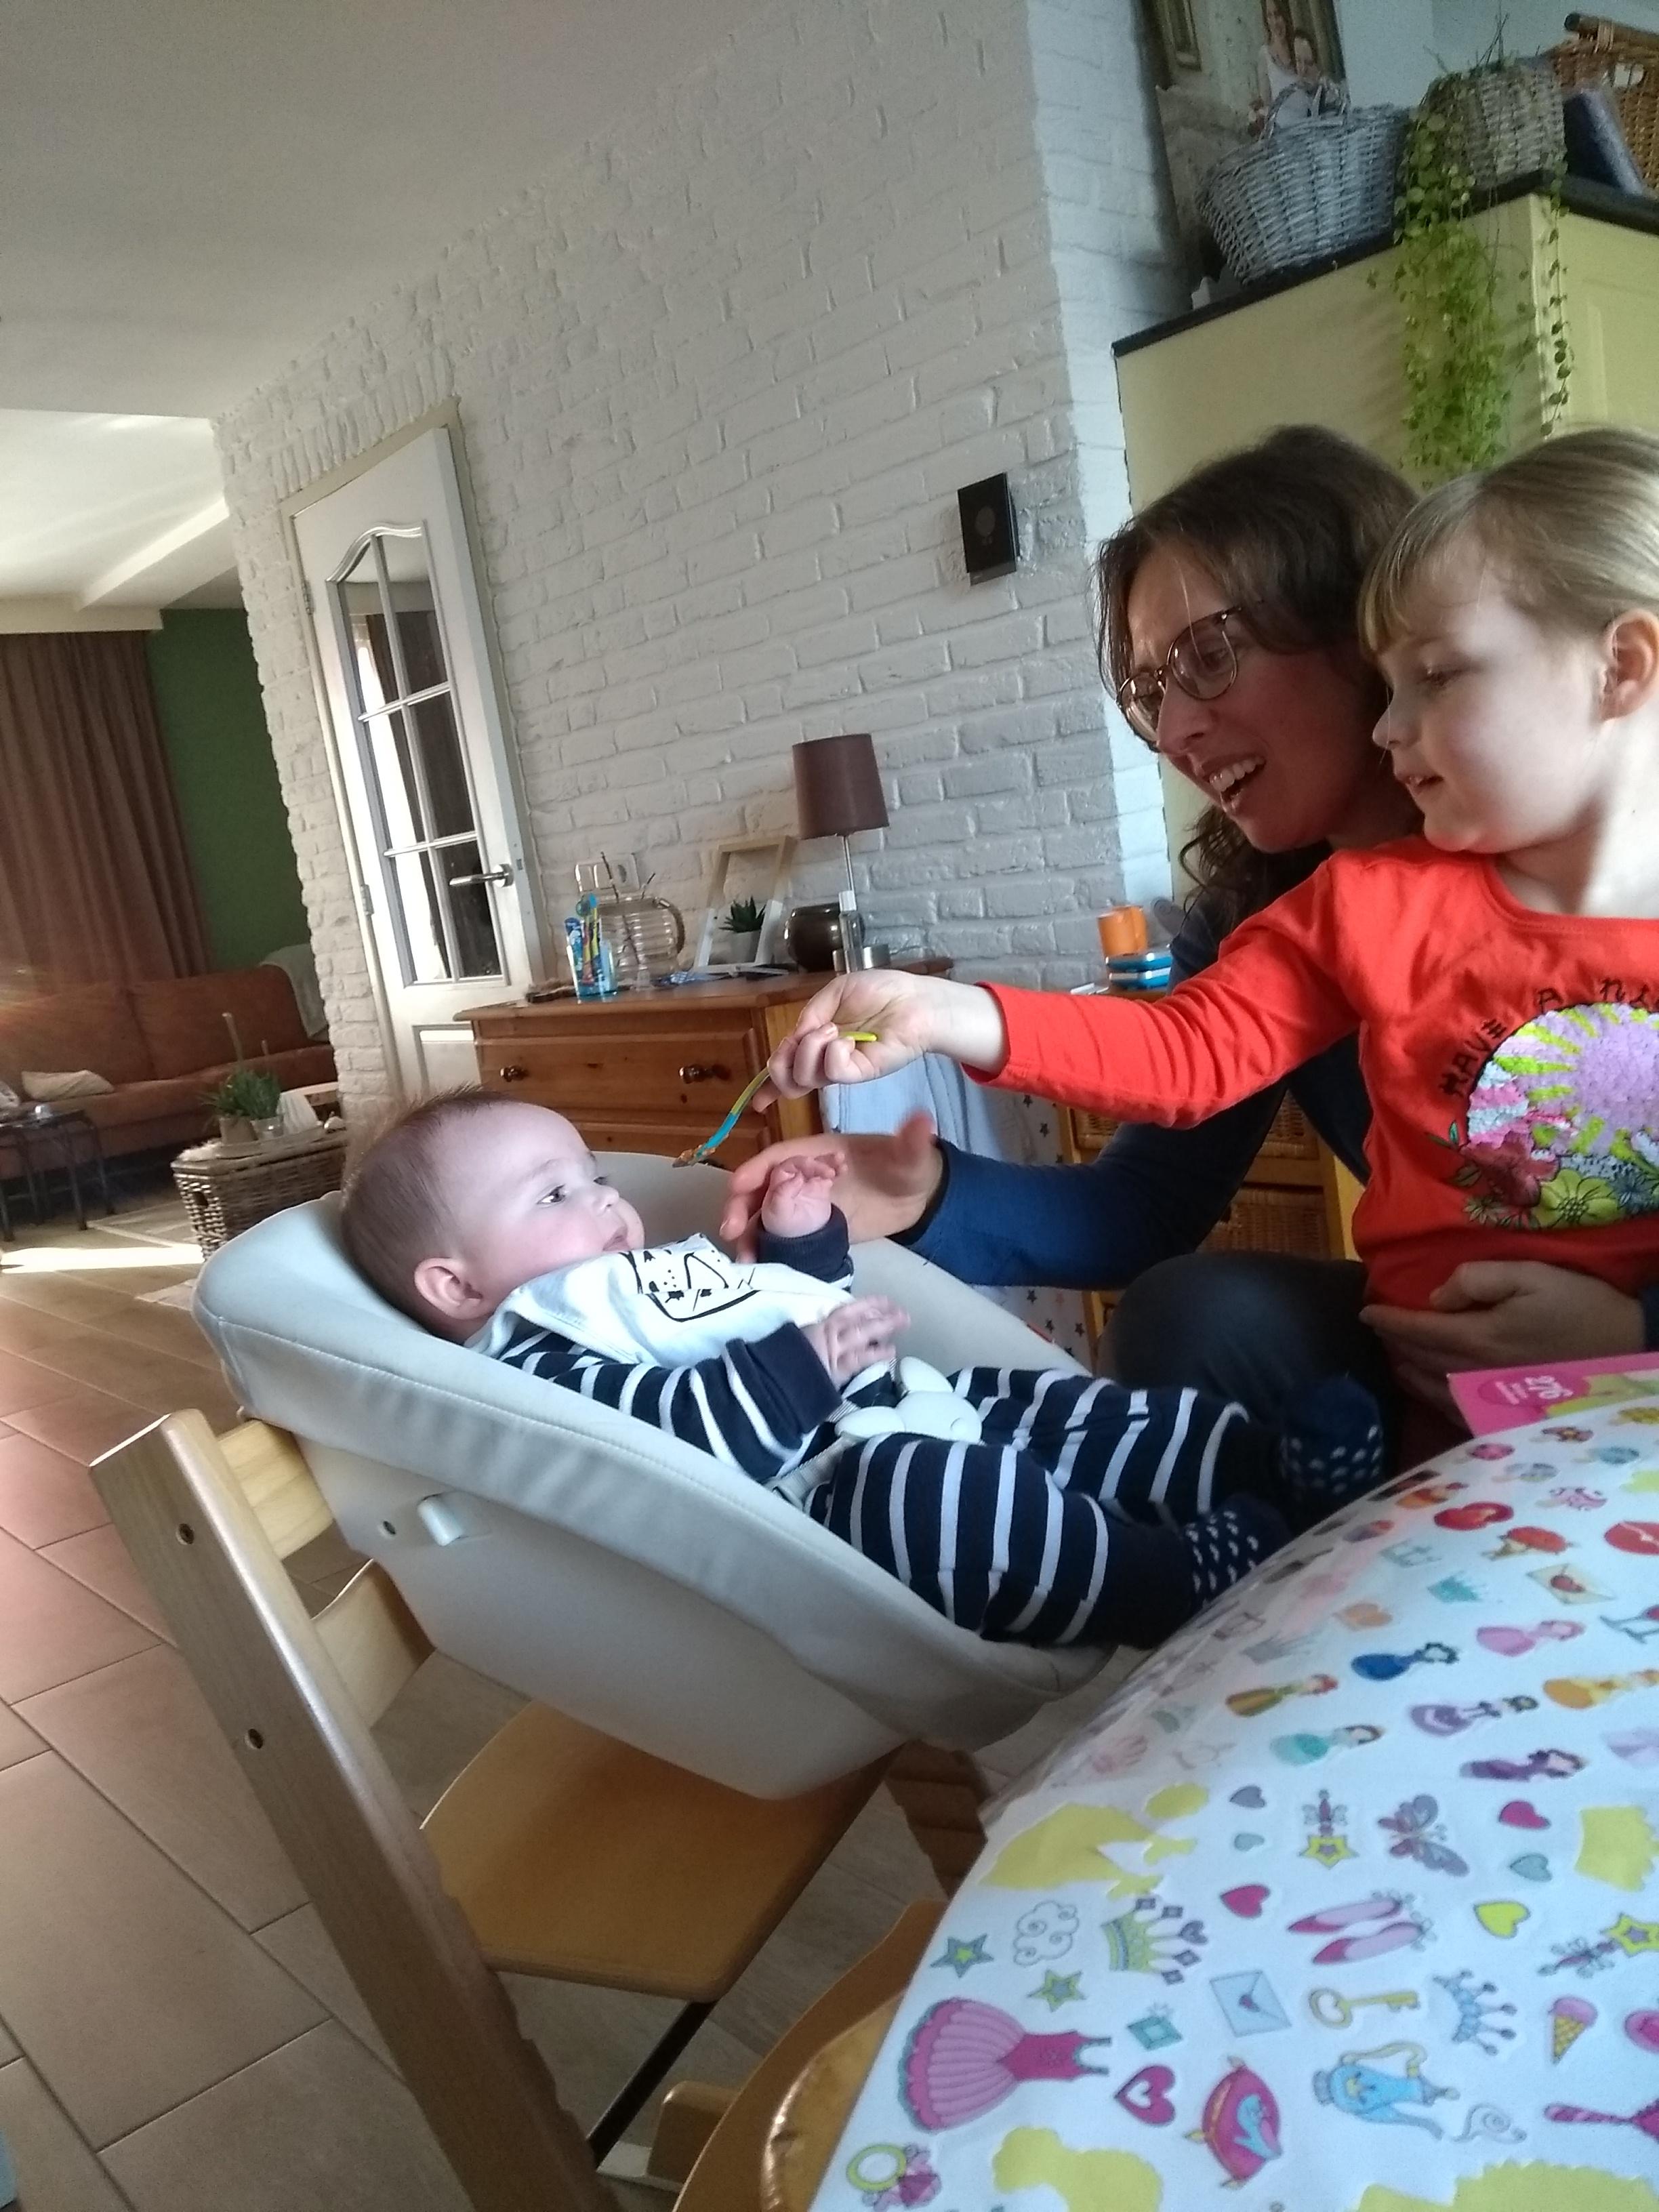 babyhapjes, baby, vijf maanden, baby vijf maanden, babybroertje, broertje, mama van drie, mamalife, mamablog, mamalifestyle, lalogblog, lalog.nl, lalog